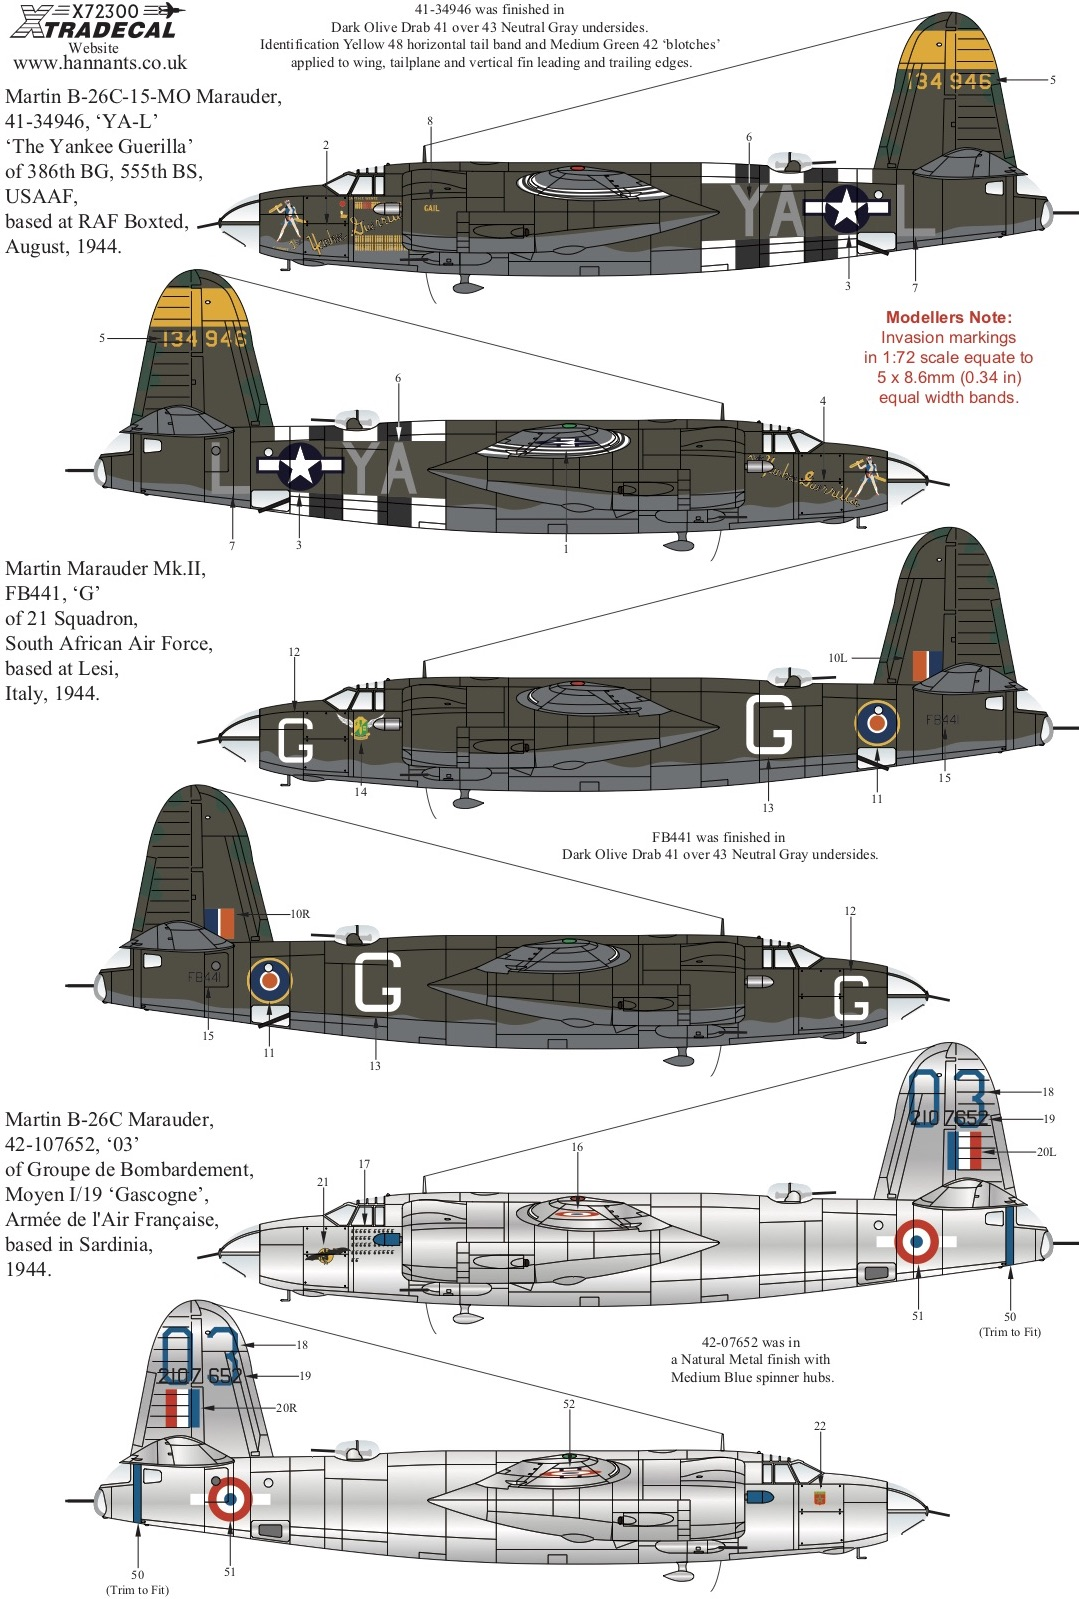 Description: Martin B-26 Marauder (7) 41-34946 YA-L 386BG 555BS 'The Yankee  Guerrilla' RAF Boxted 1944; FB441/G 21 Sqn South Africa AF Italy 1944;